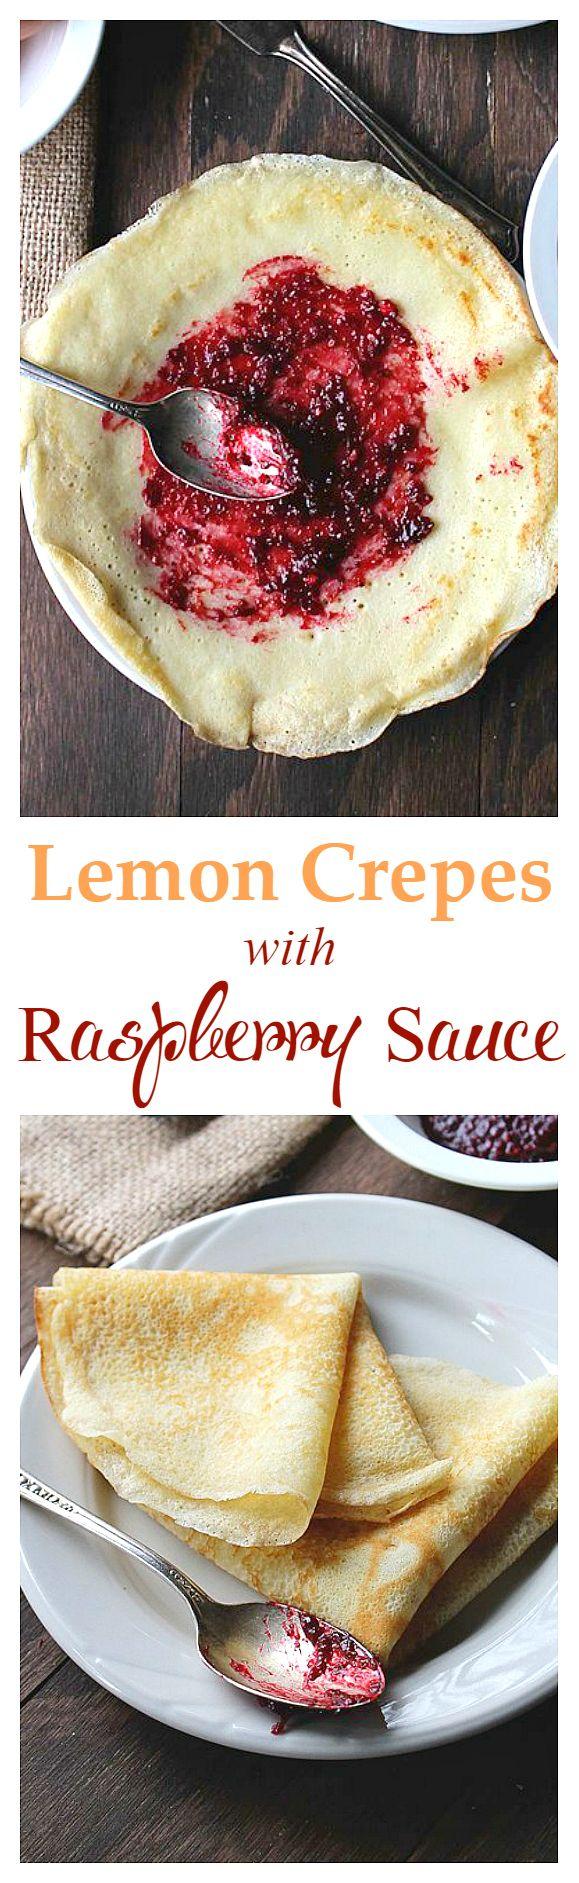 Lemon Crepes with Raspberry Sauce - Sweet, warm raspberry sauce over fluffy, citrusy crepes.